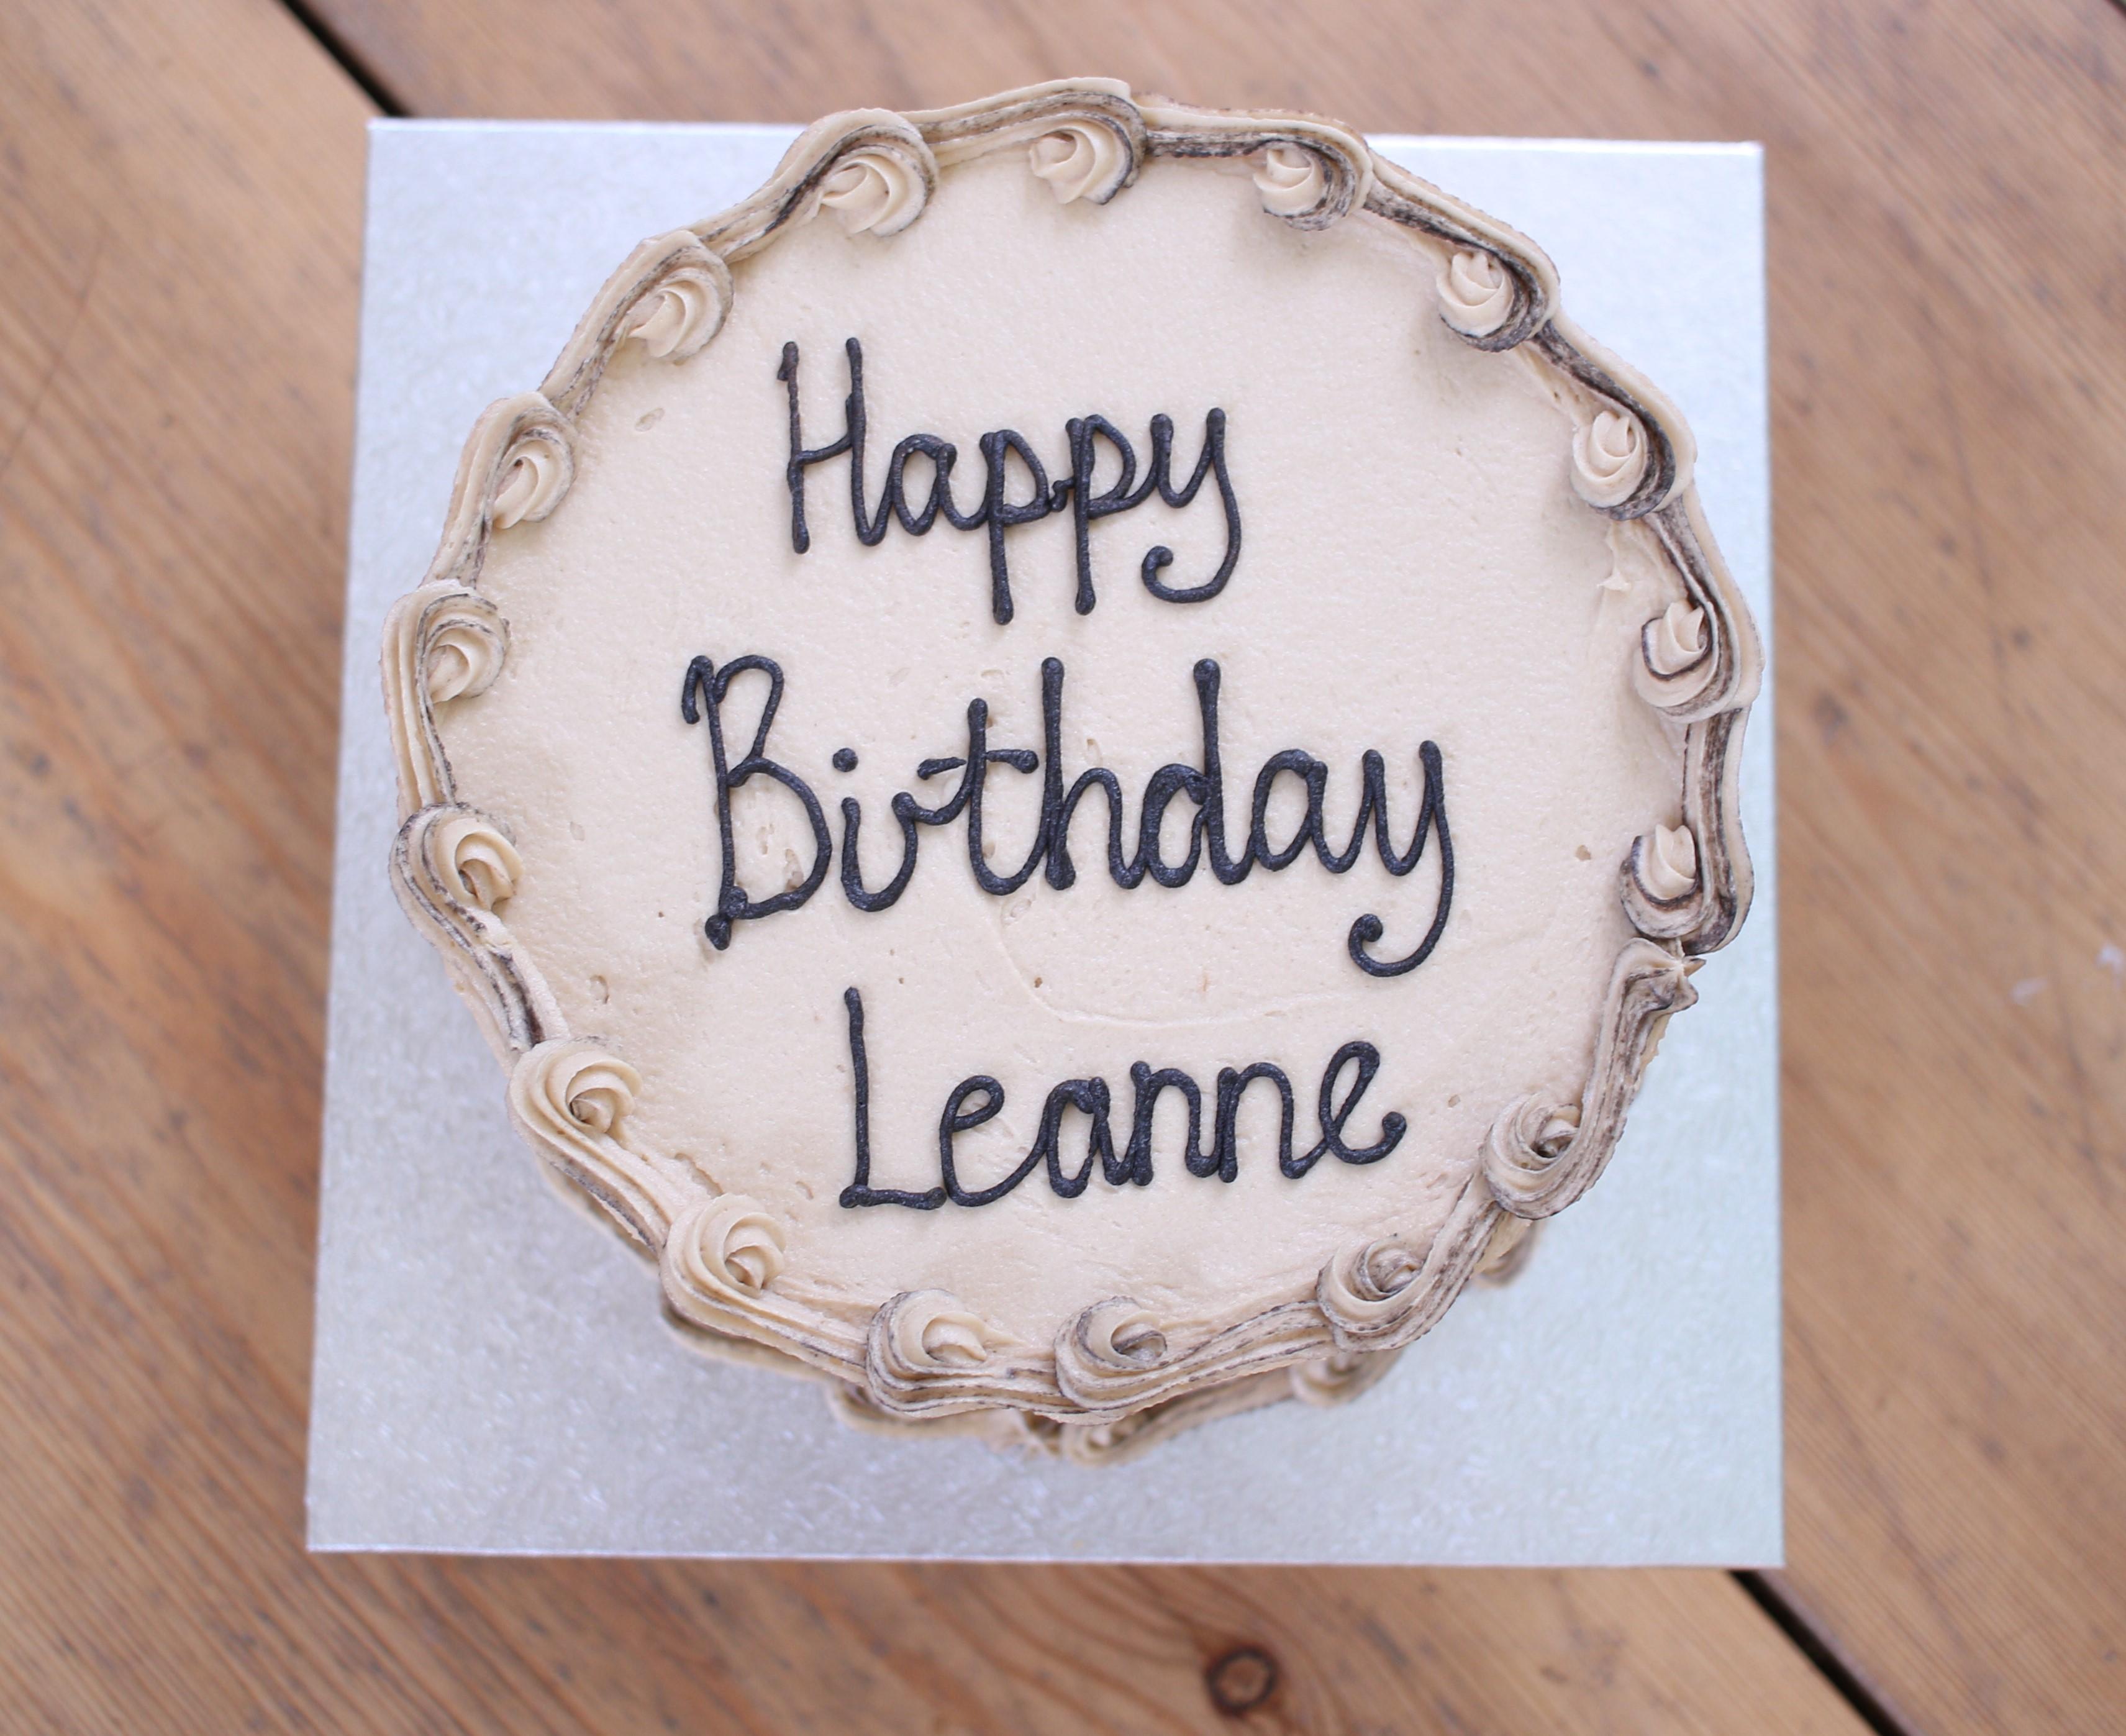 Happy birthday Leanne cake